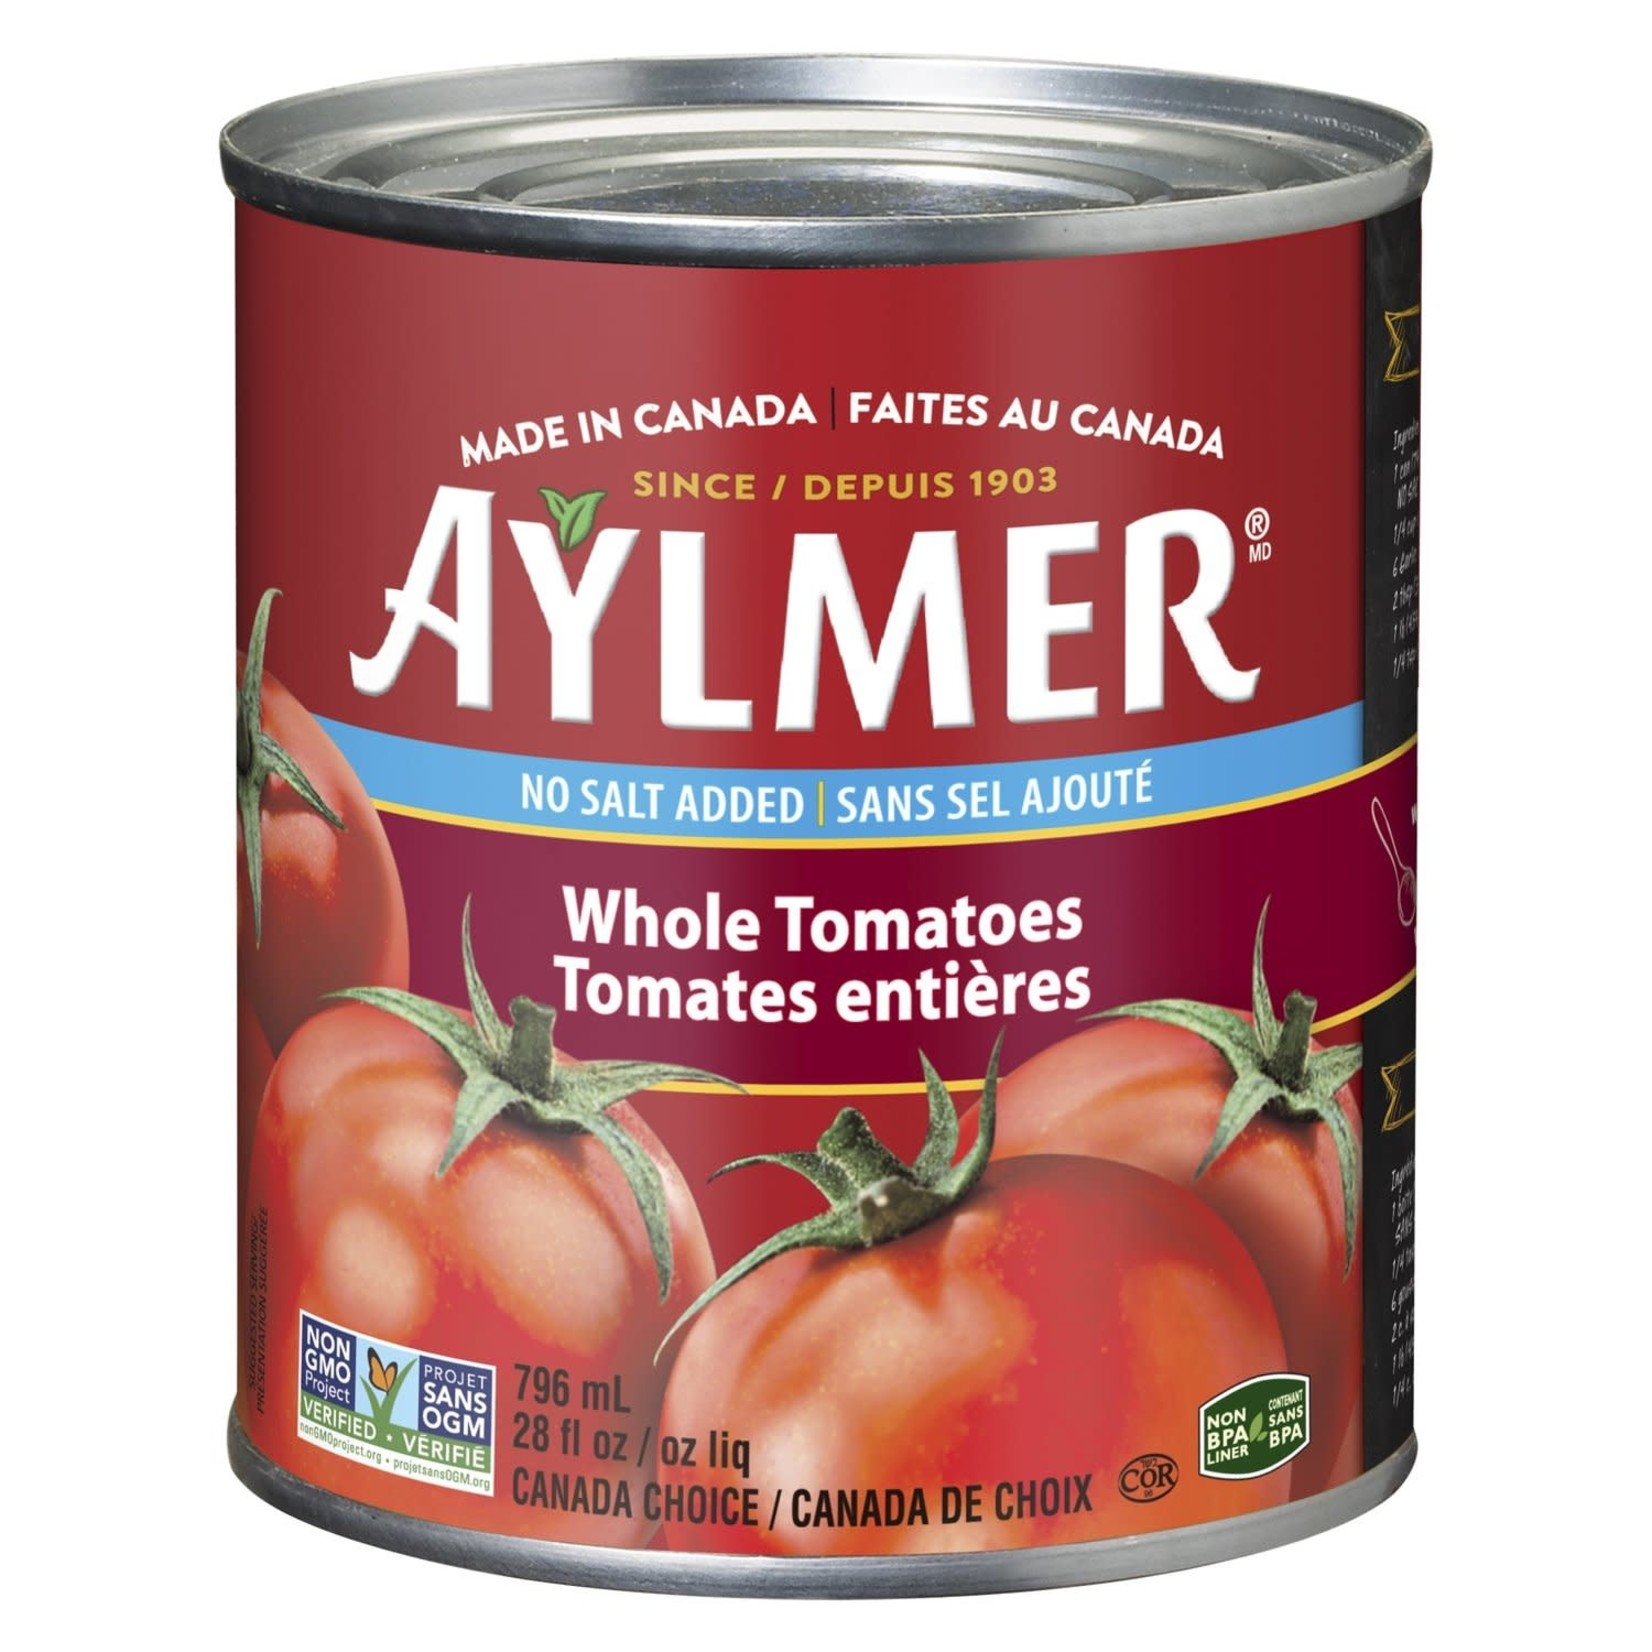 Aylmer Whole Tomatoes No Salt 796ml